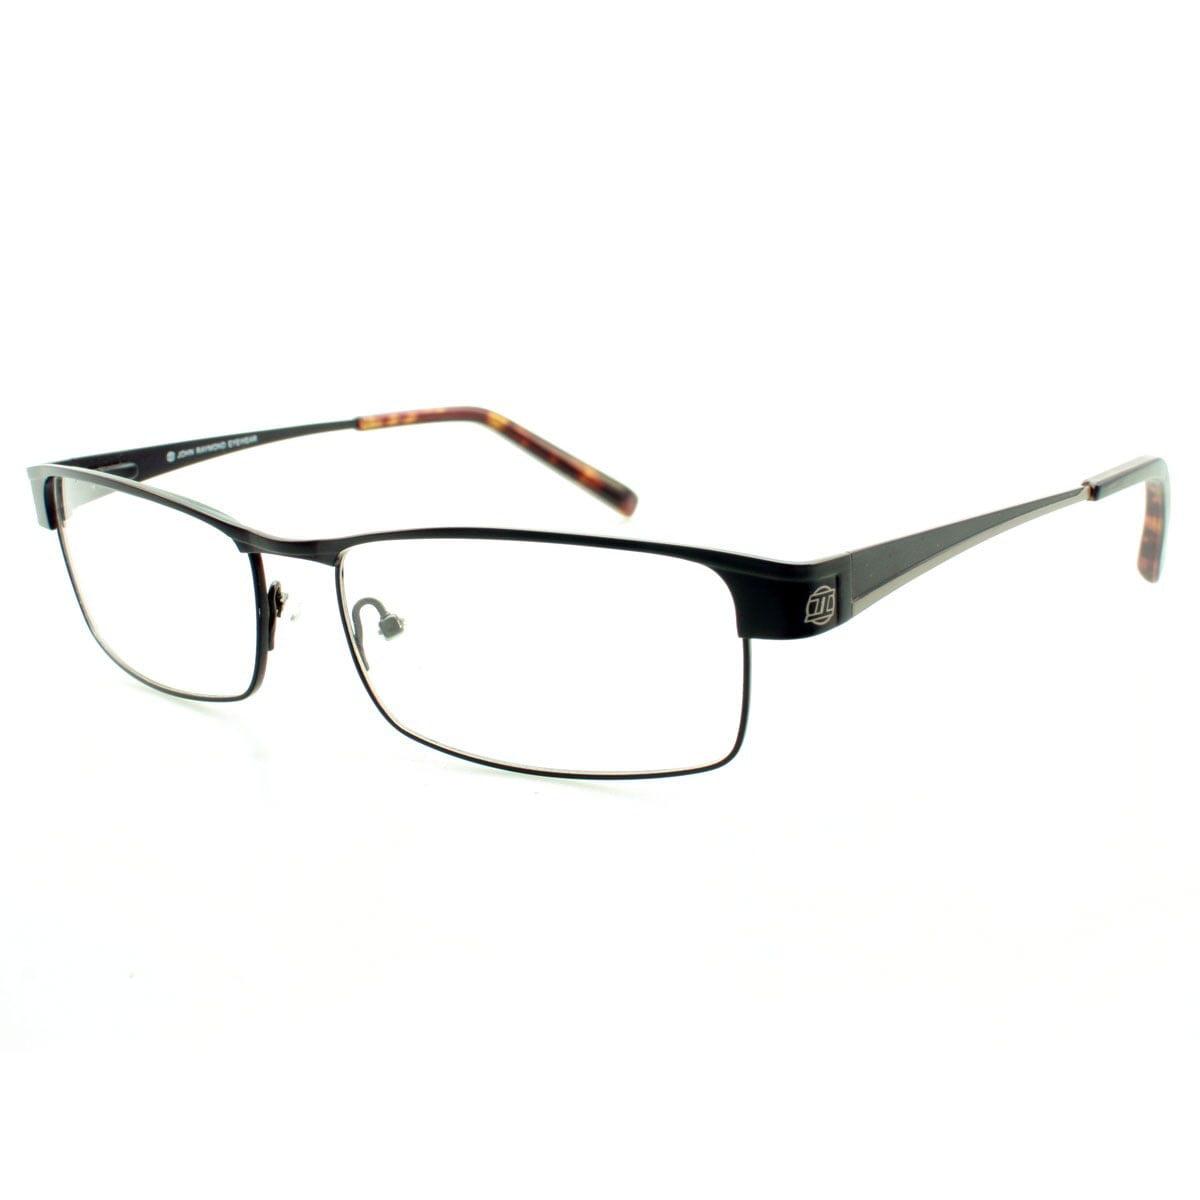 Fatheadz Eyewear John Raymond Men's Release Prescription Eyeglasses - Walmart.com | Tuggl